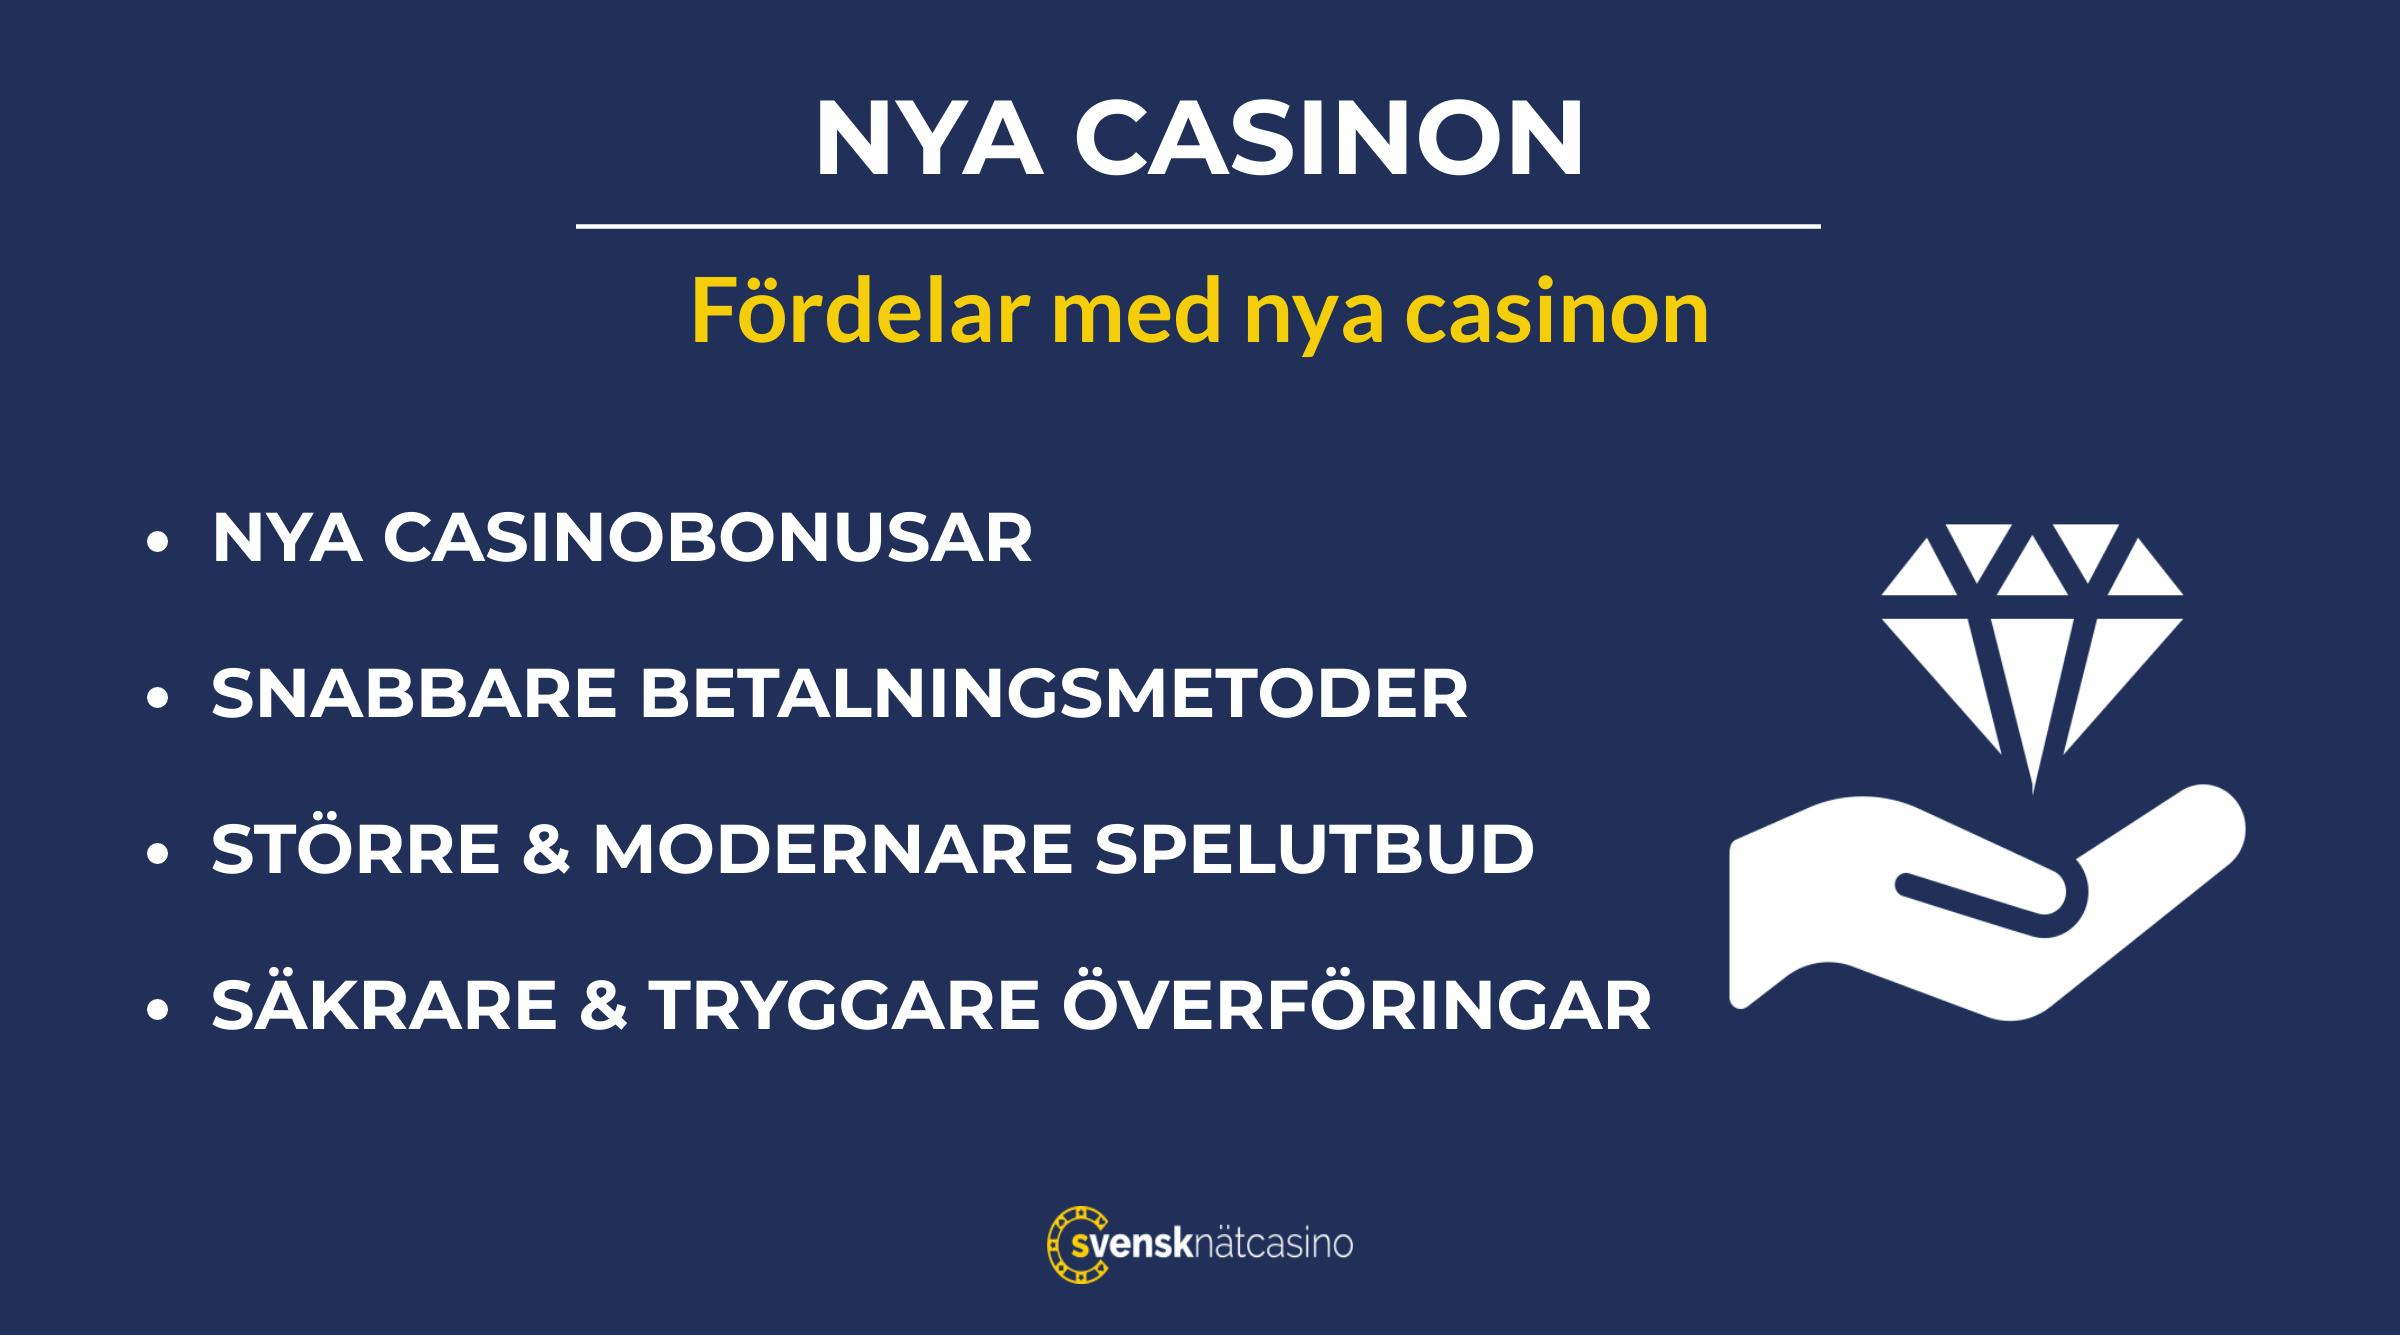 nya casinon f o 48195973 1